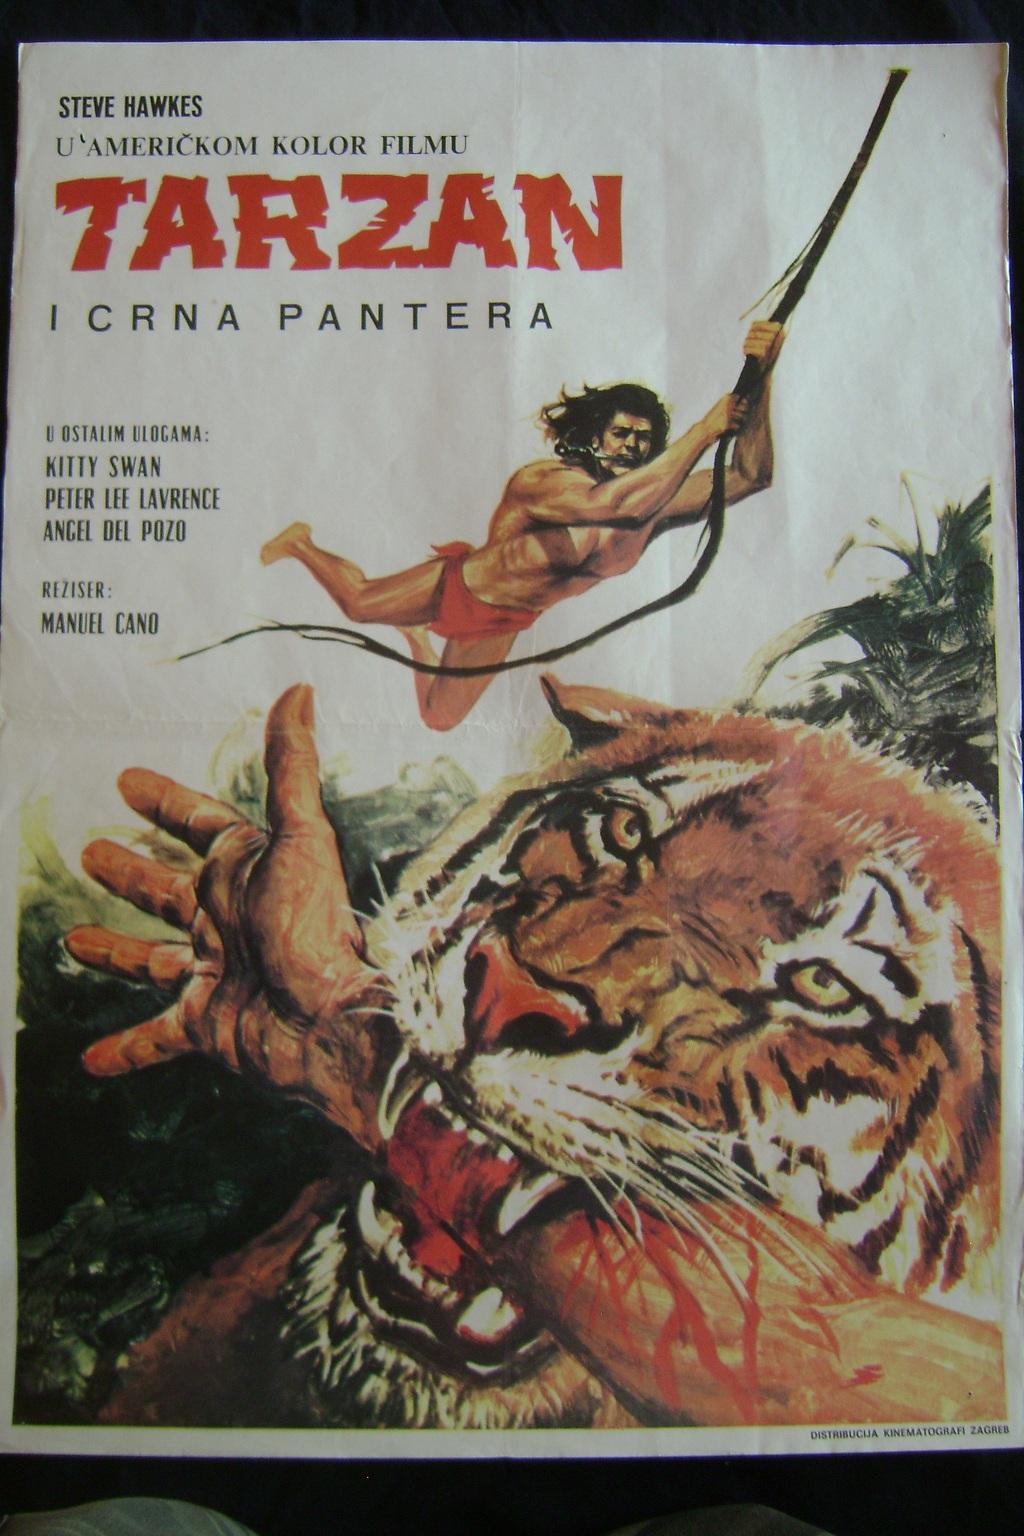 Filmski_poster_TARZAN_I_CRNA_PANTERA_1975_1.JPG